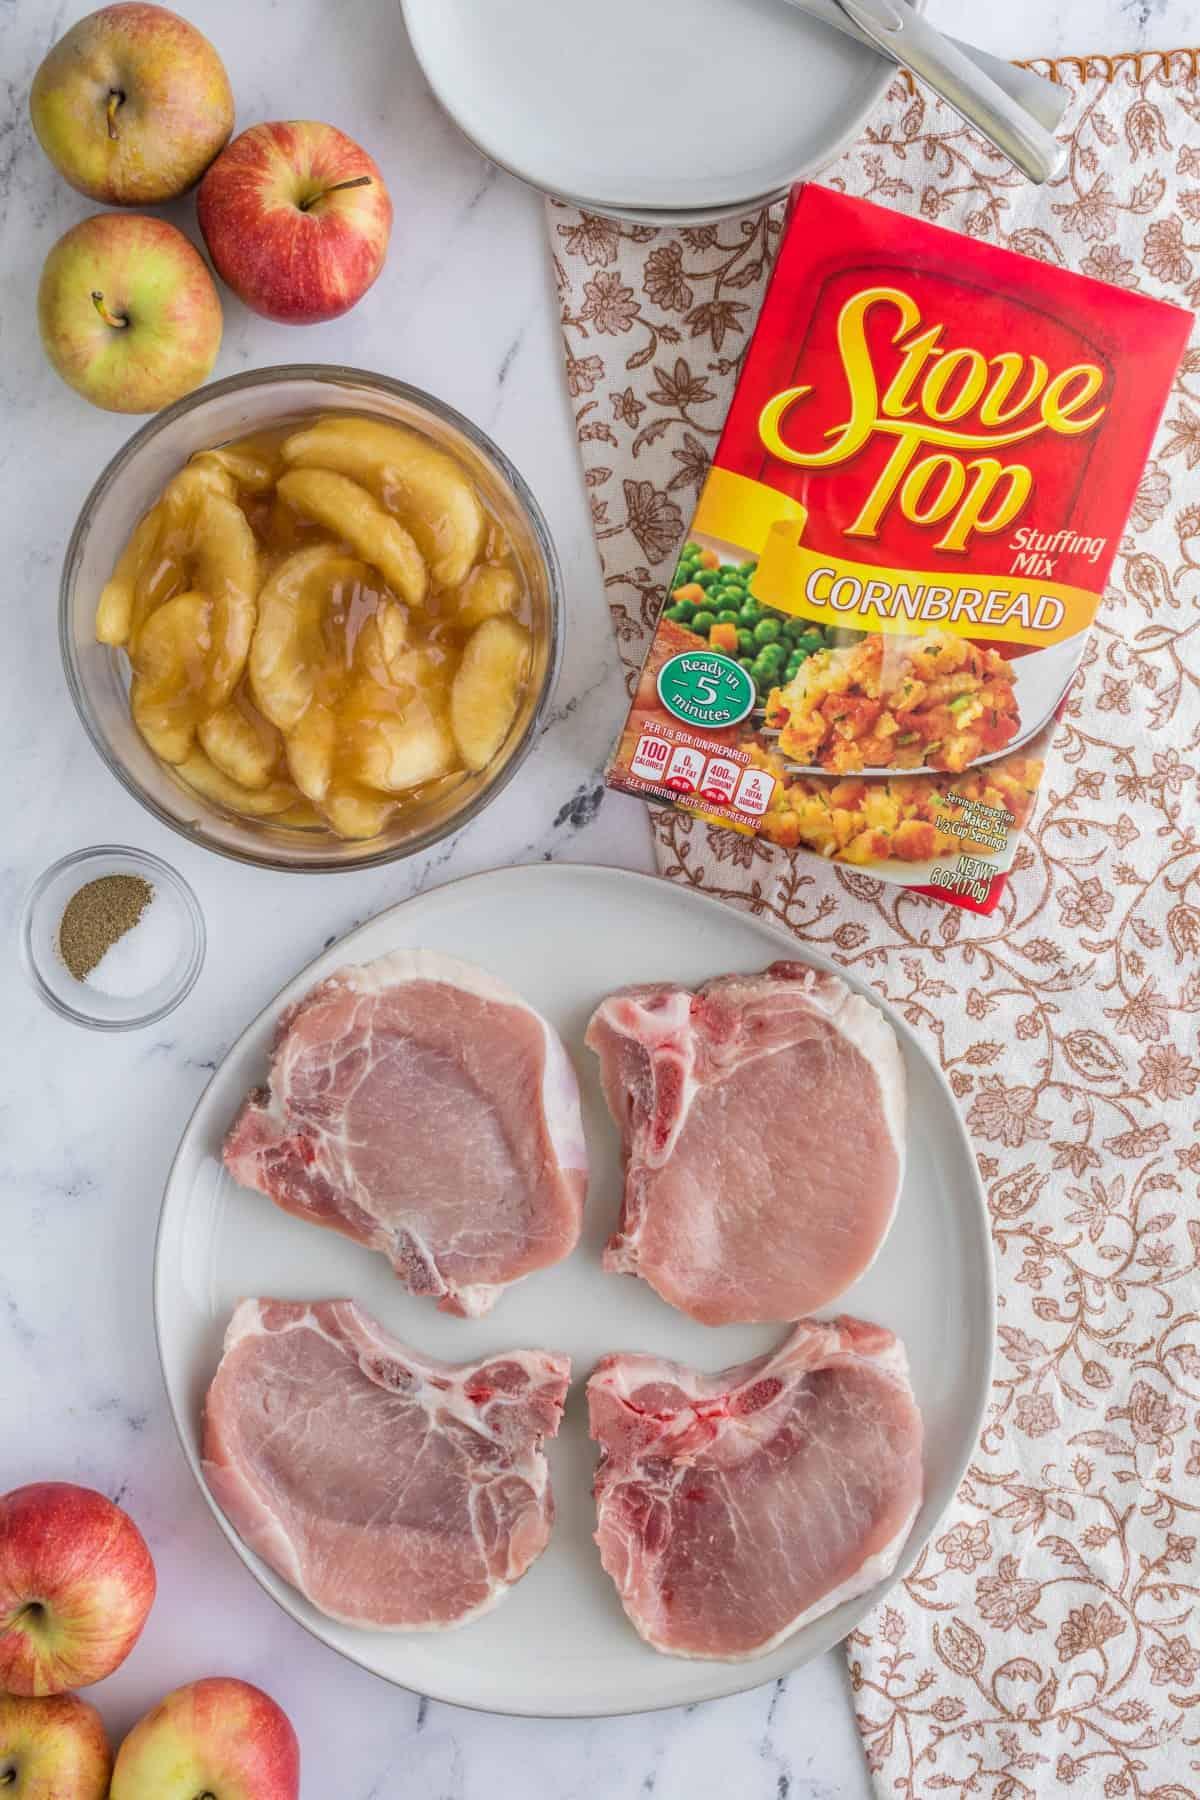 Ingredients for pork chops